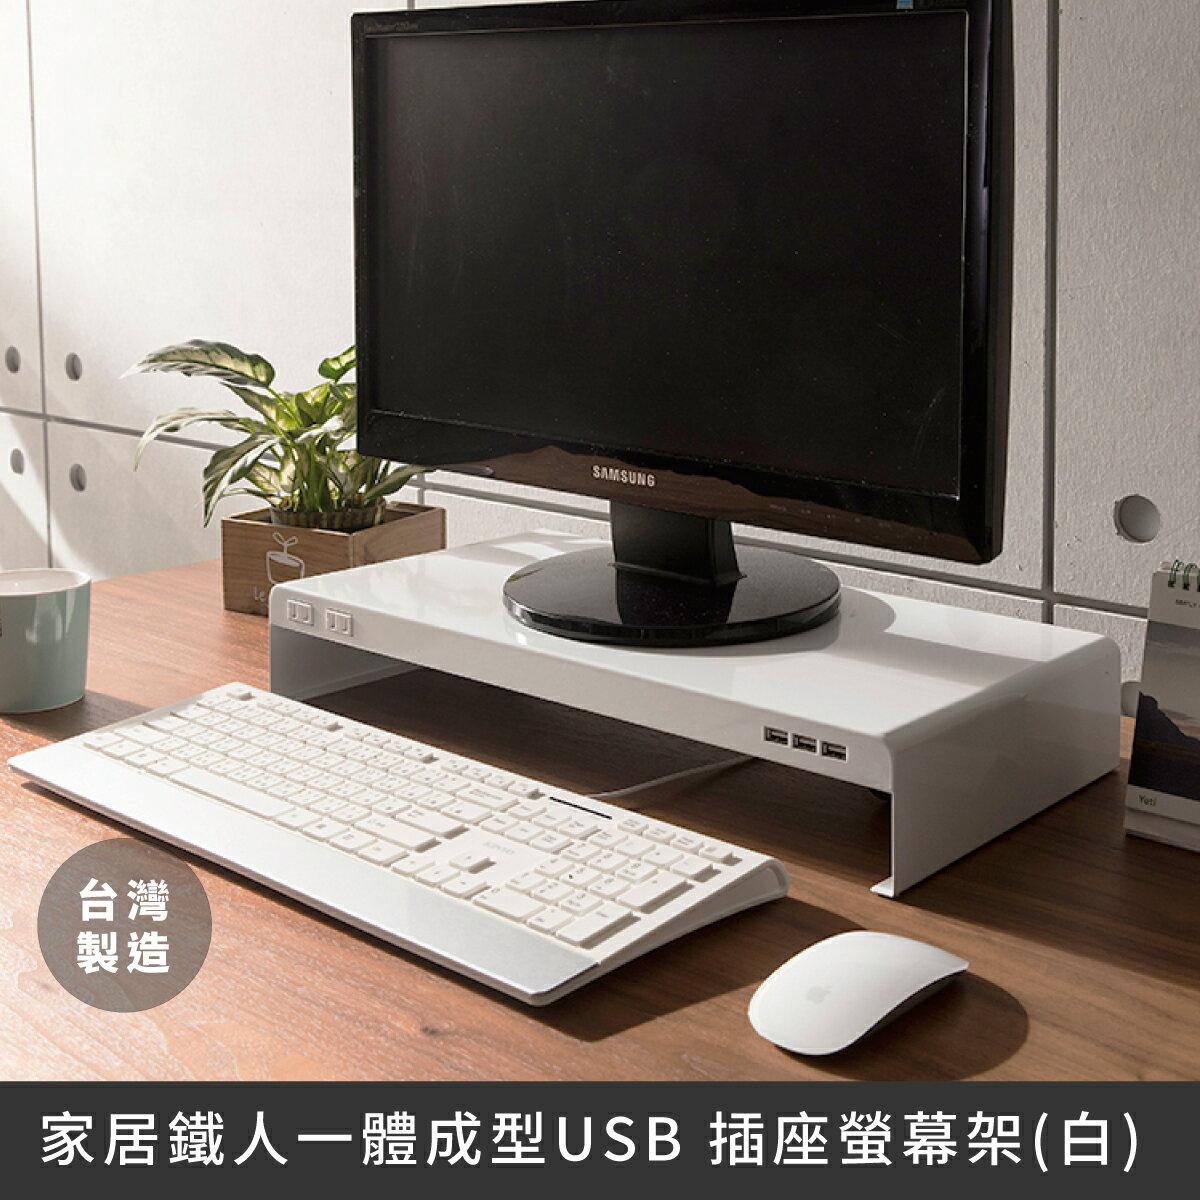 【myhome8居家無限】家居鐵人一體成型USB 插座螢幕架